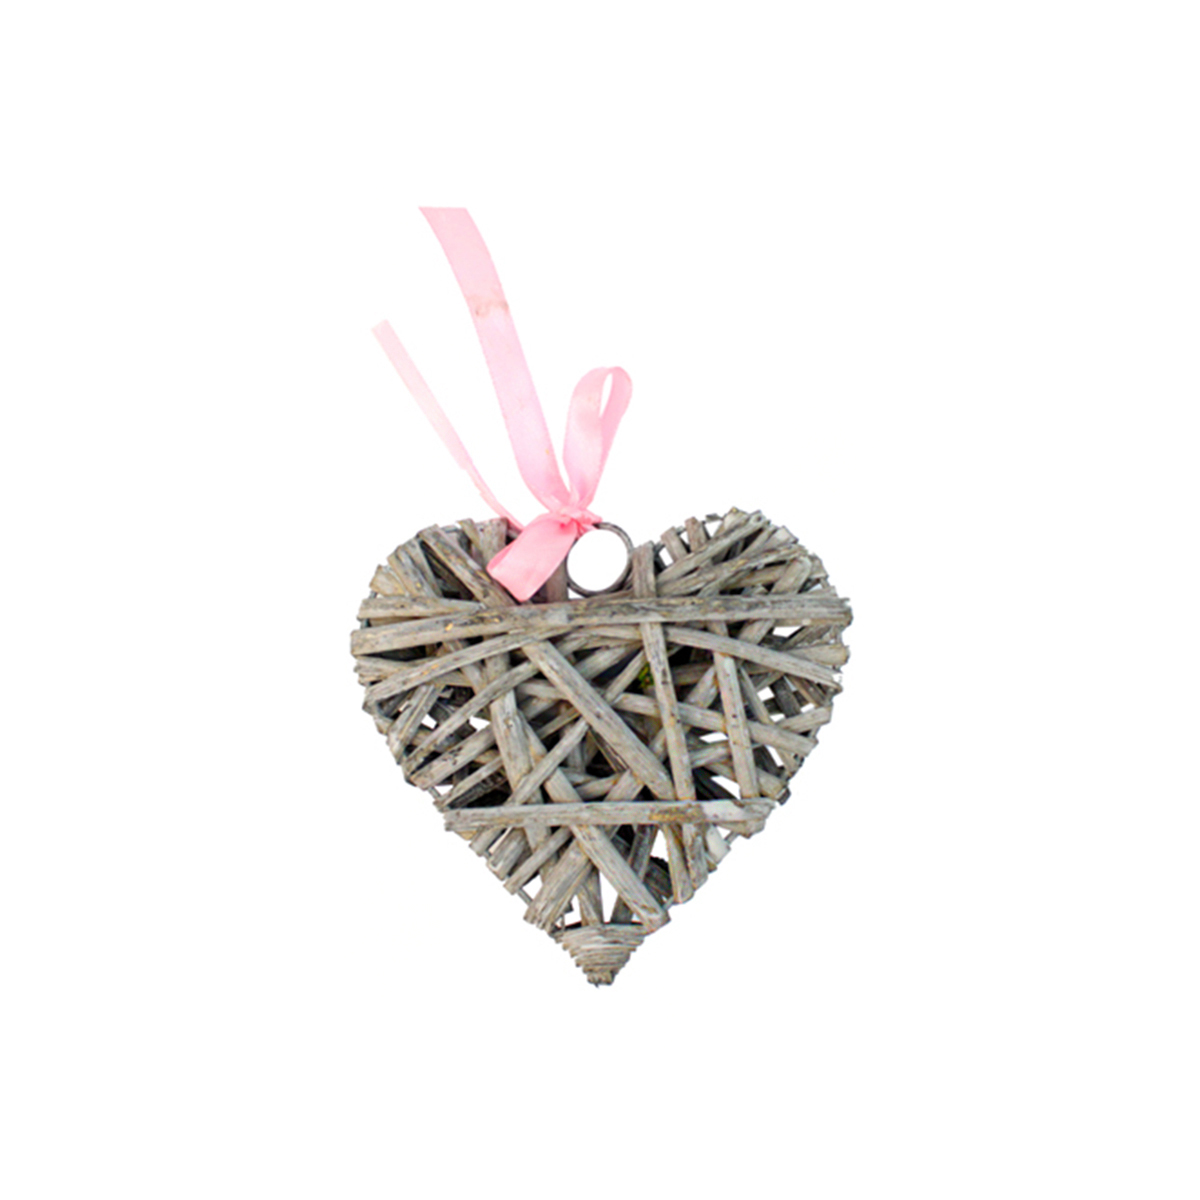 Декоративный элемент Glorex Сердце, цвет: серый, диаметр 10 см декоративный элемент dongjiang art сердце цвет фуксия 10 шт